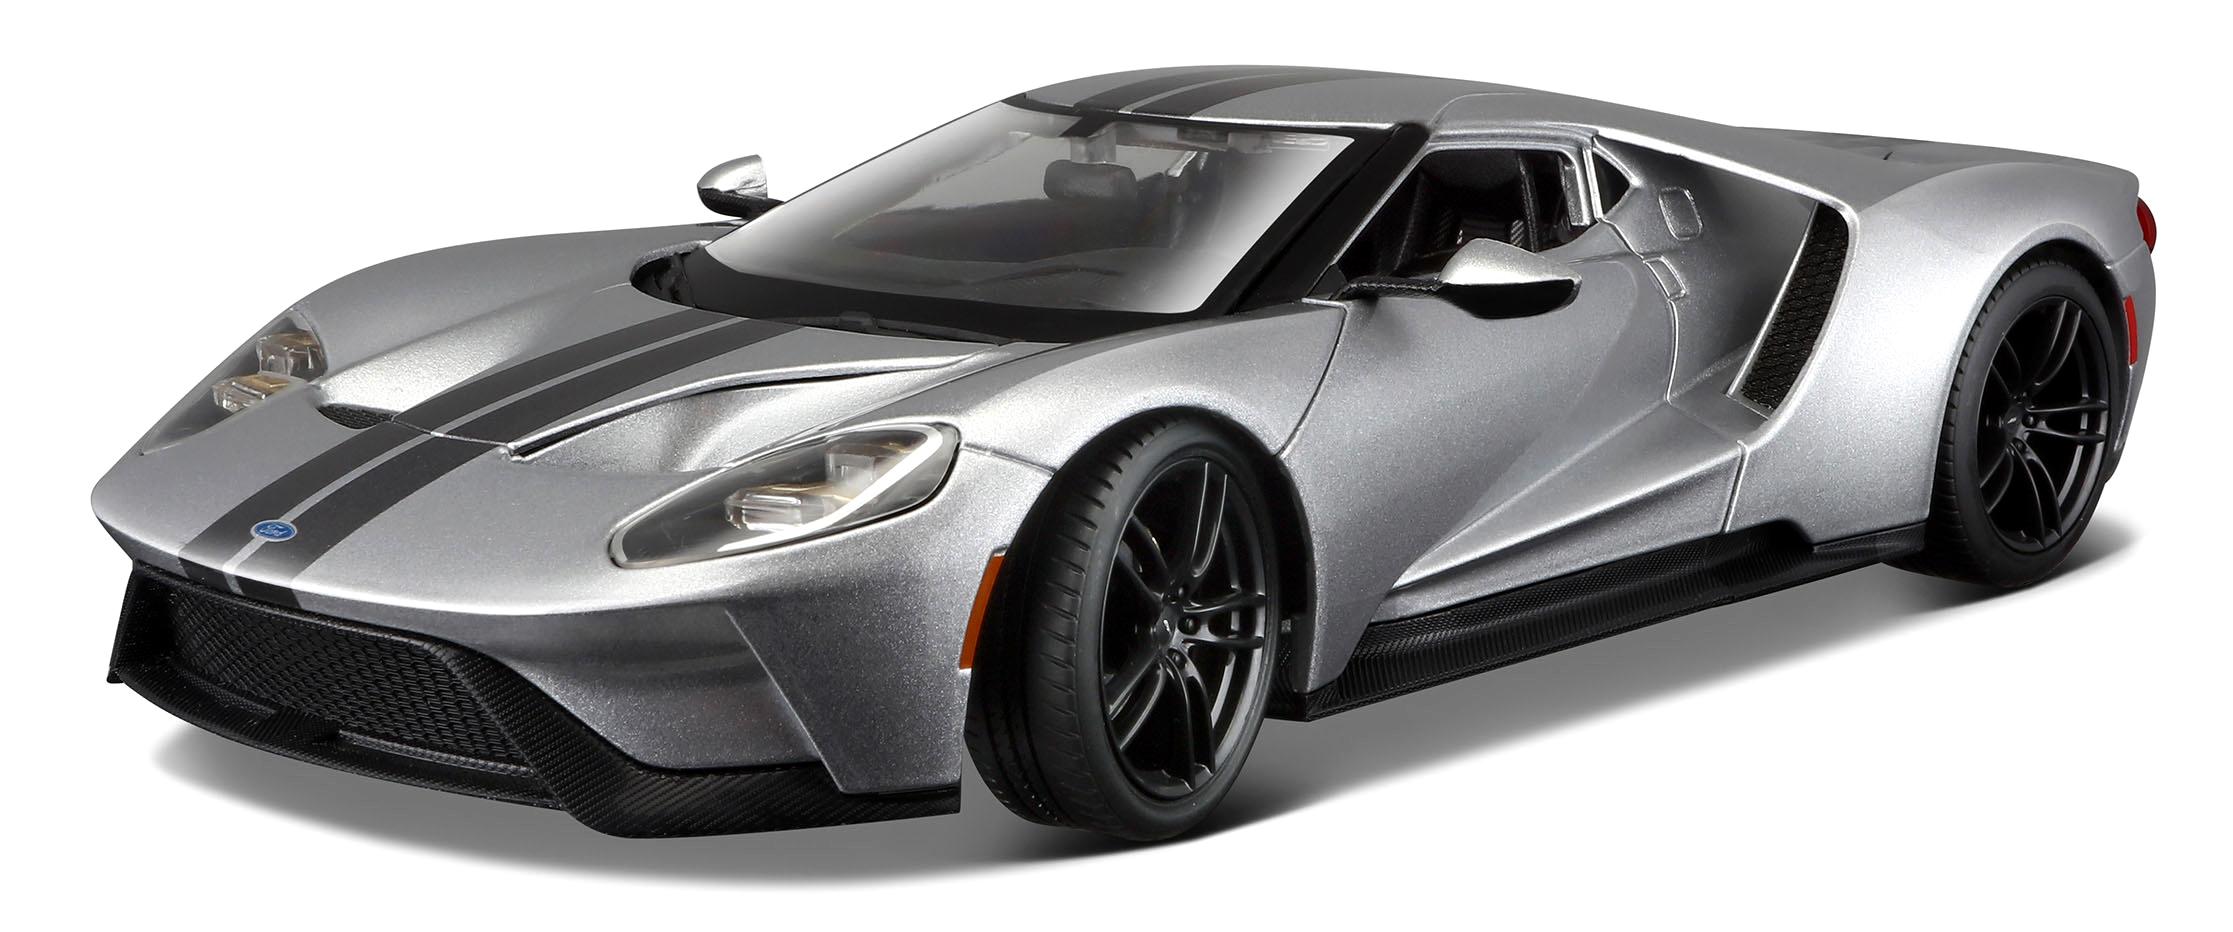 31384Z  2017 Ford GT, zilver, Maisto